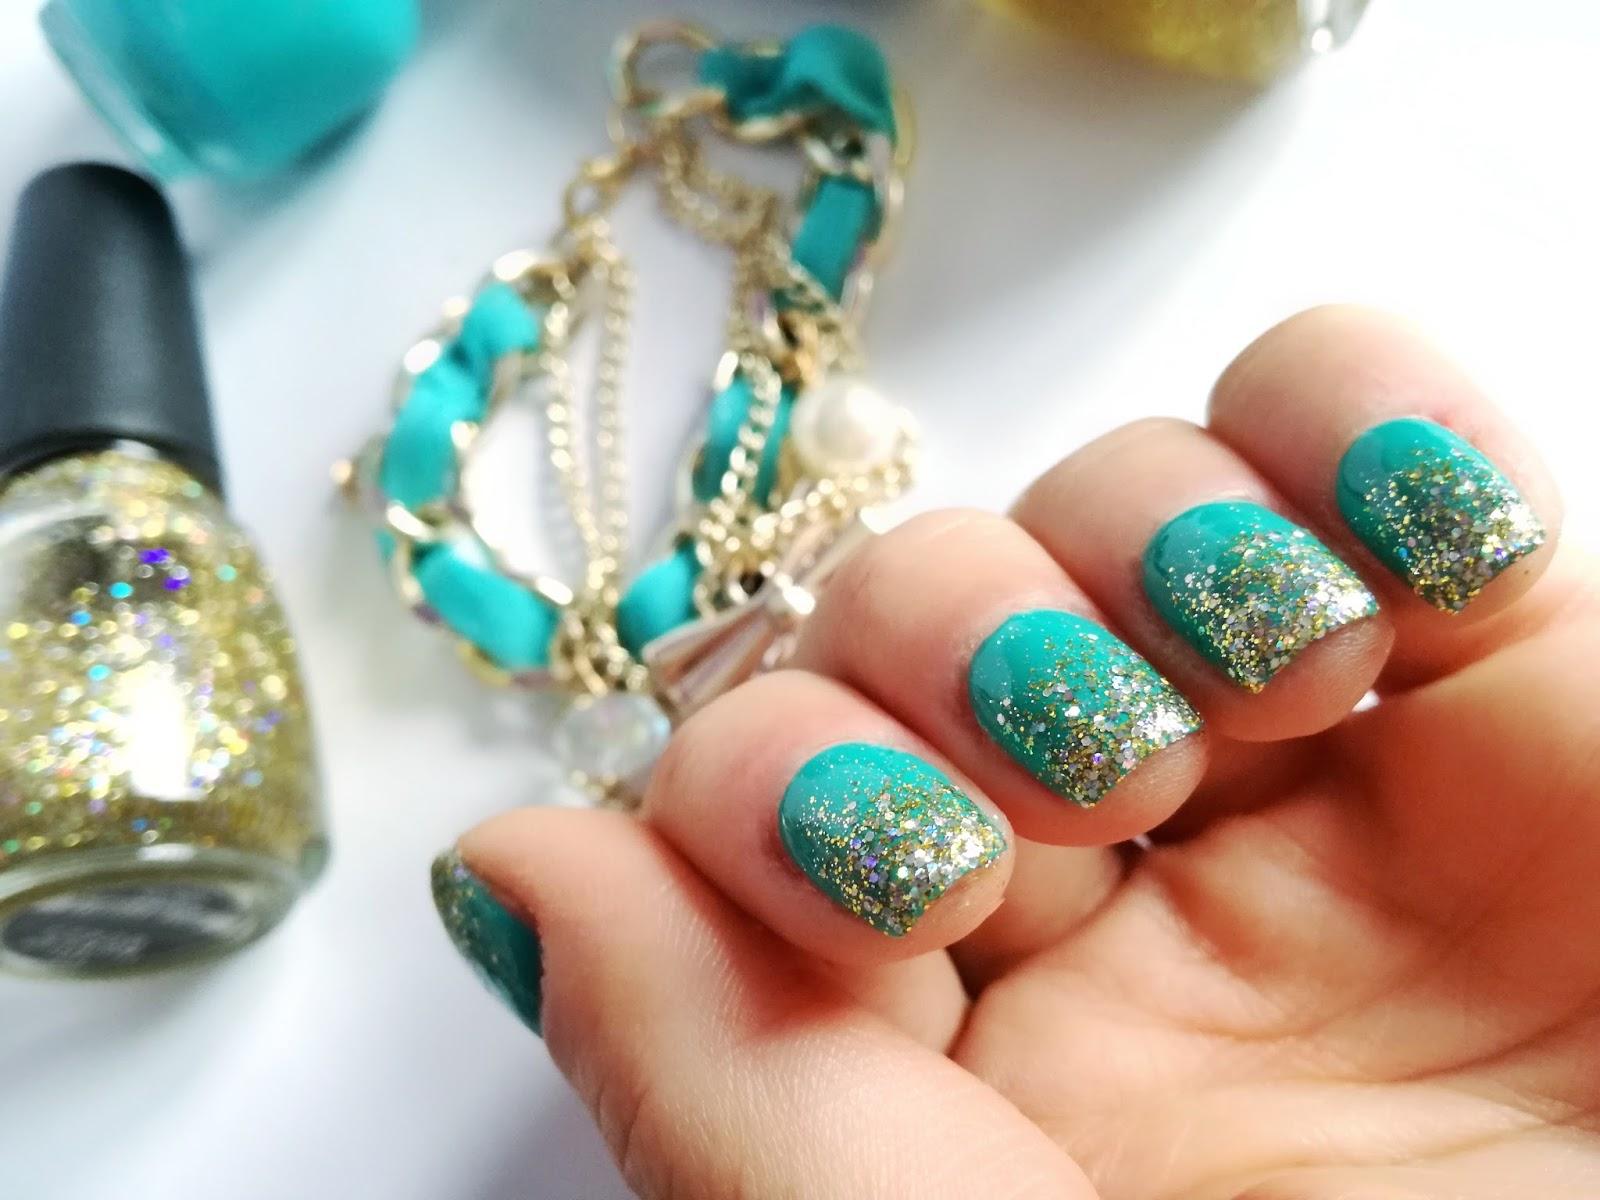 rosies-store-inspired-nail-art